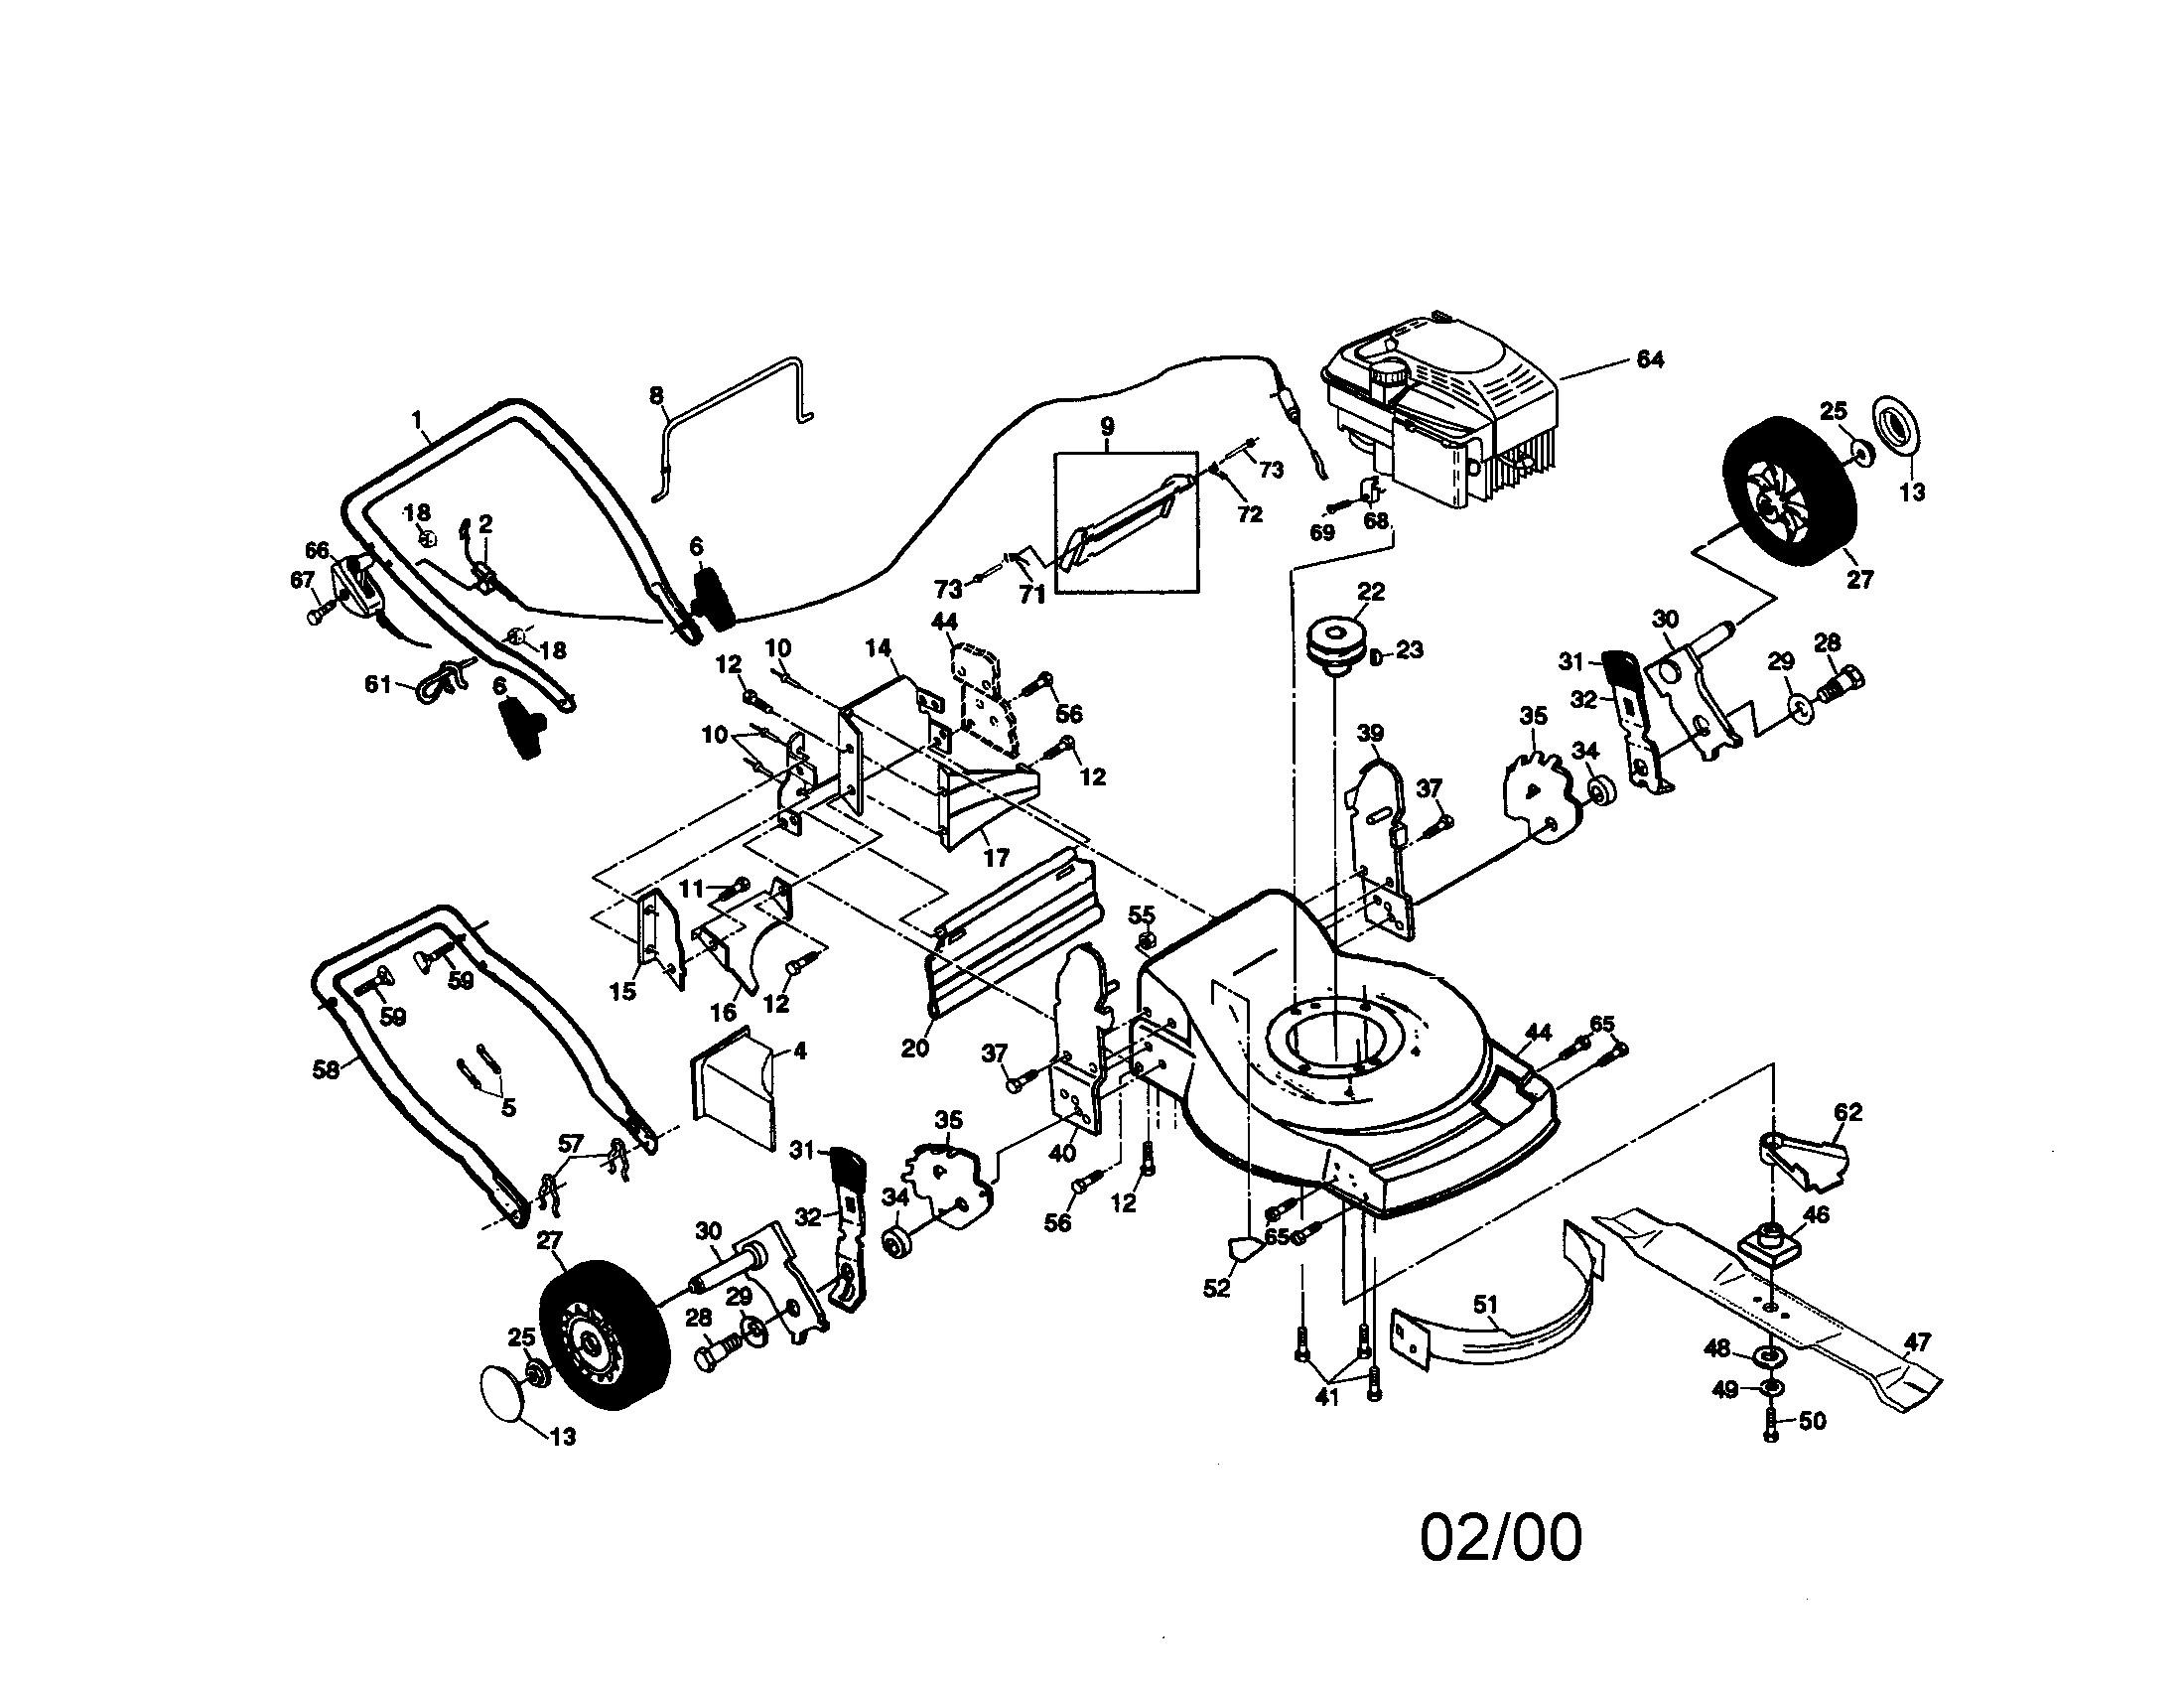 Craftsman Lawn Mower Parts Diagram 917 Craftsman 6 Hp 22 Inch Rear Discharge Lawn Mower Of Craftsman Lawn Mower Parts Diagram